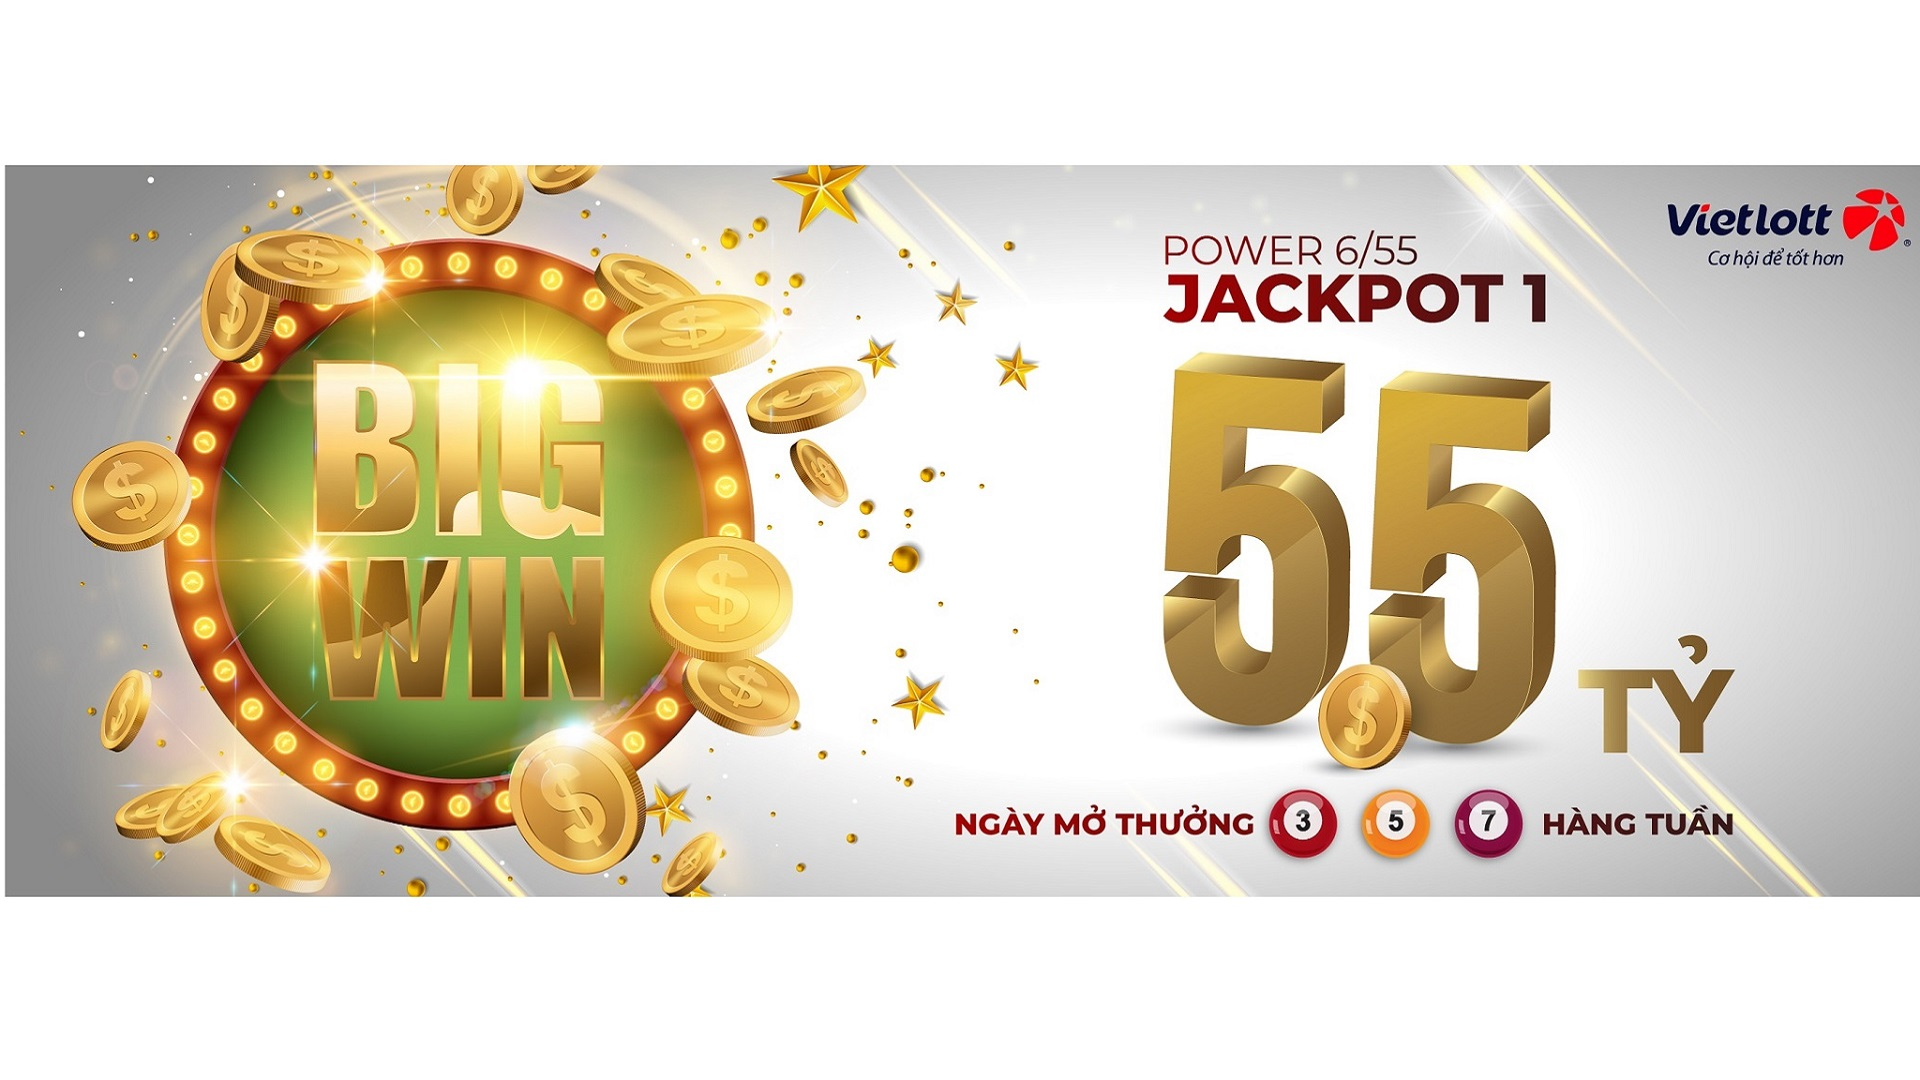 JACKPOT Power 6/55 tiếp tục vượt 50 TỶ!!!